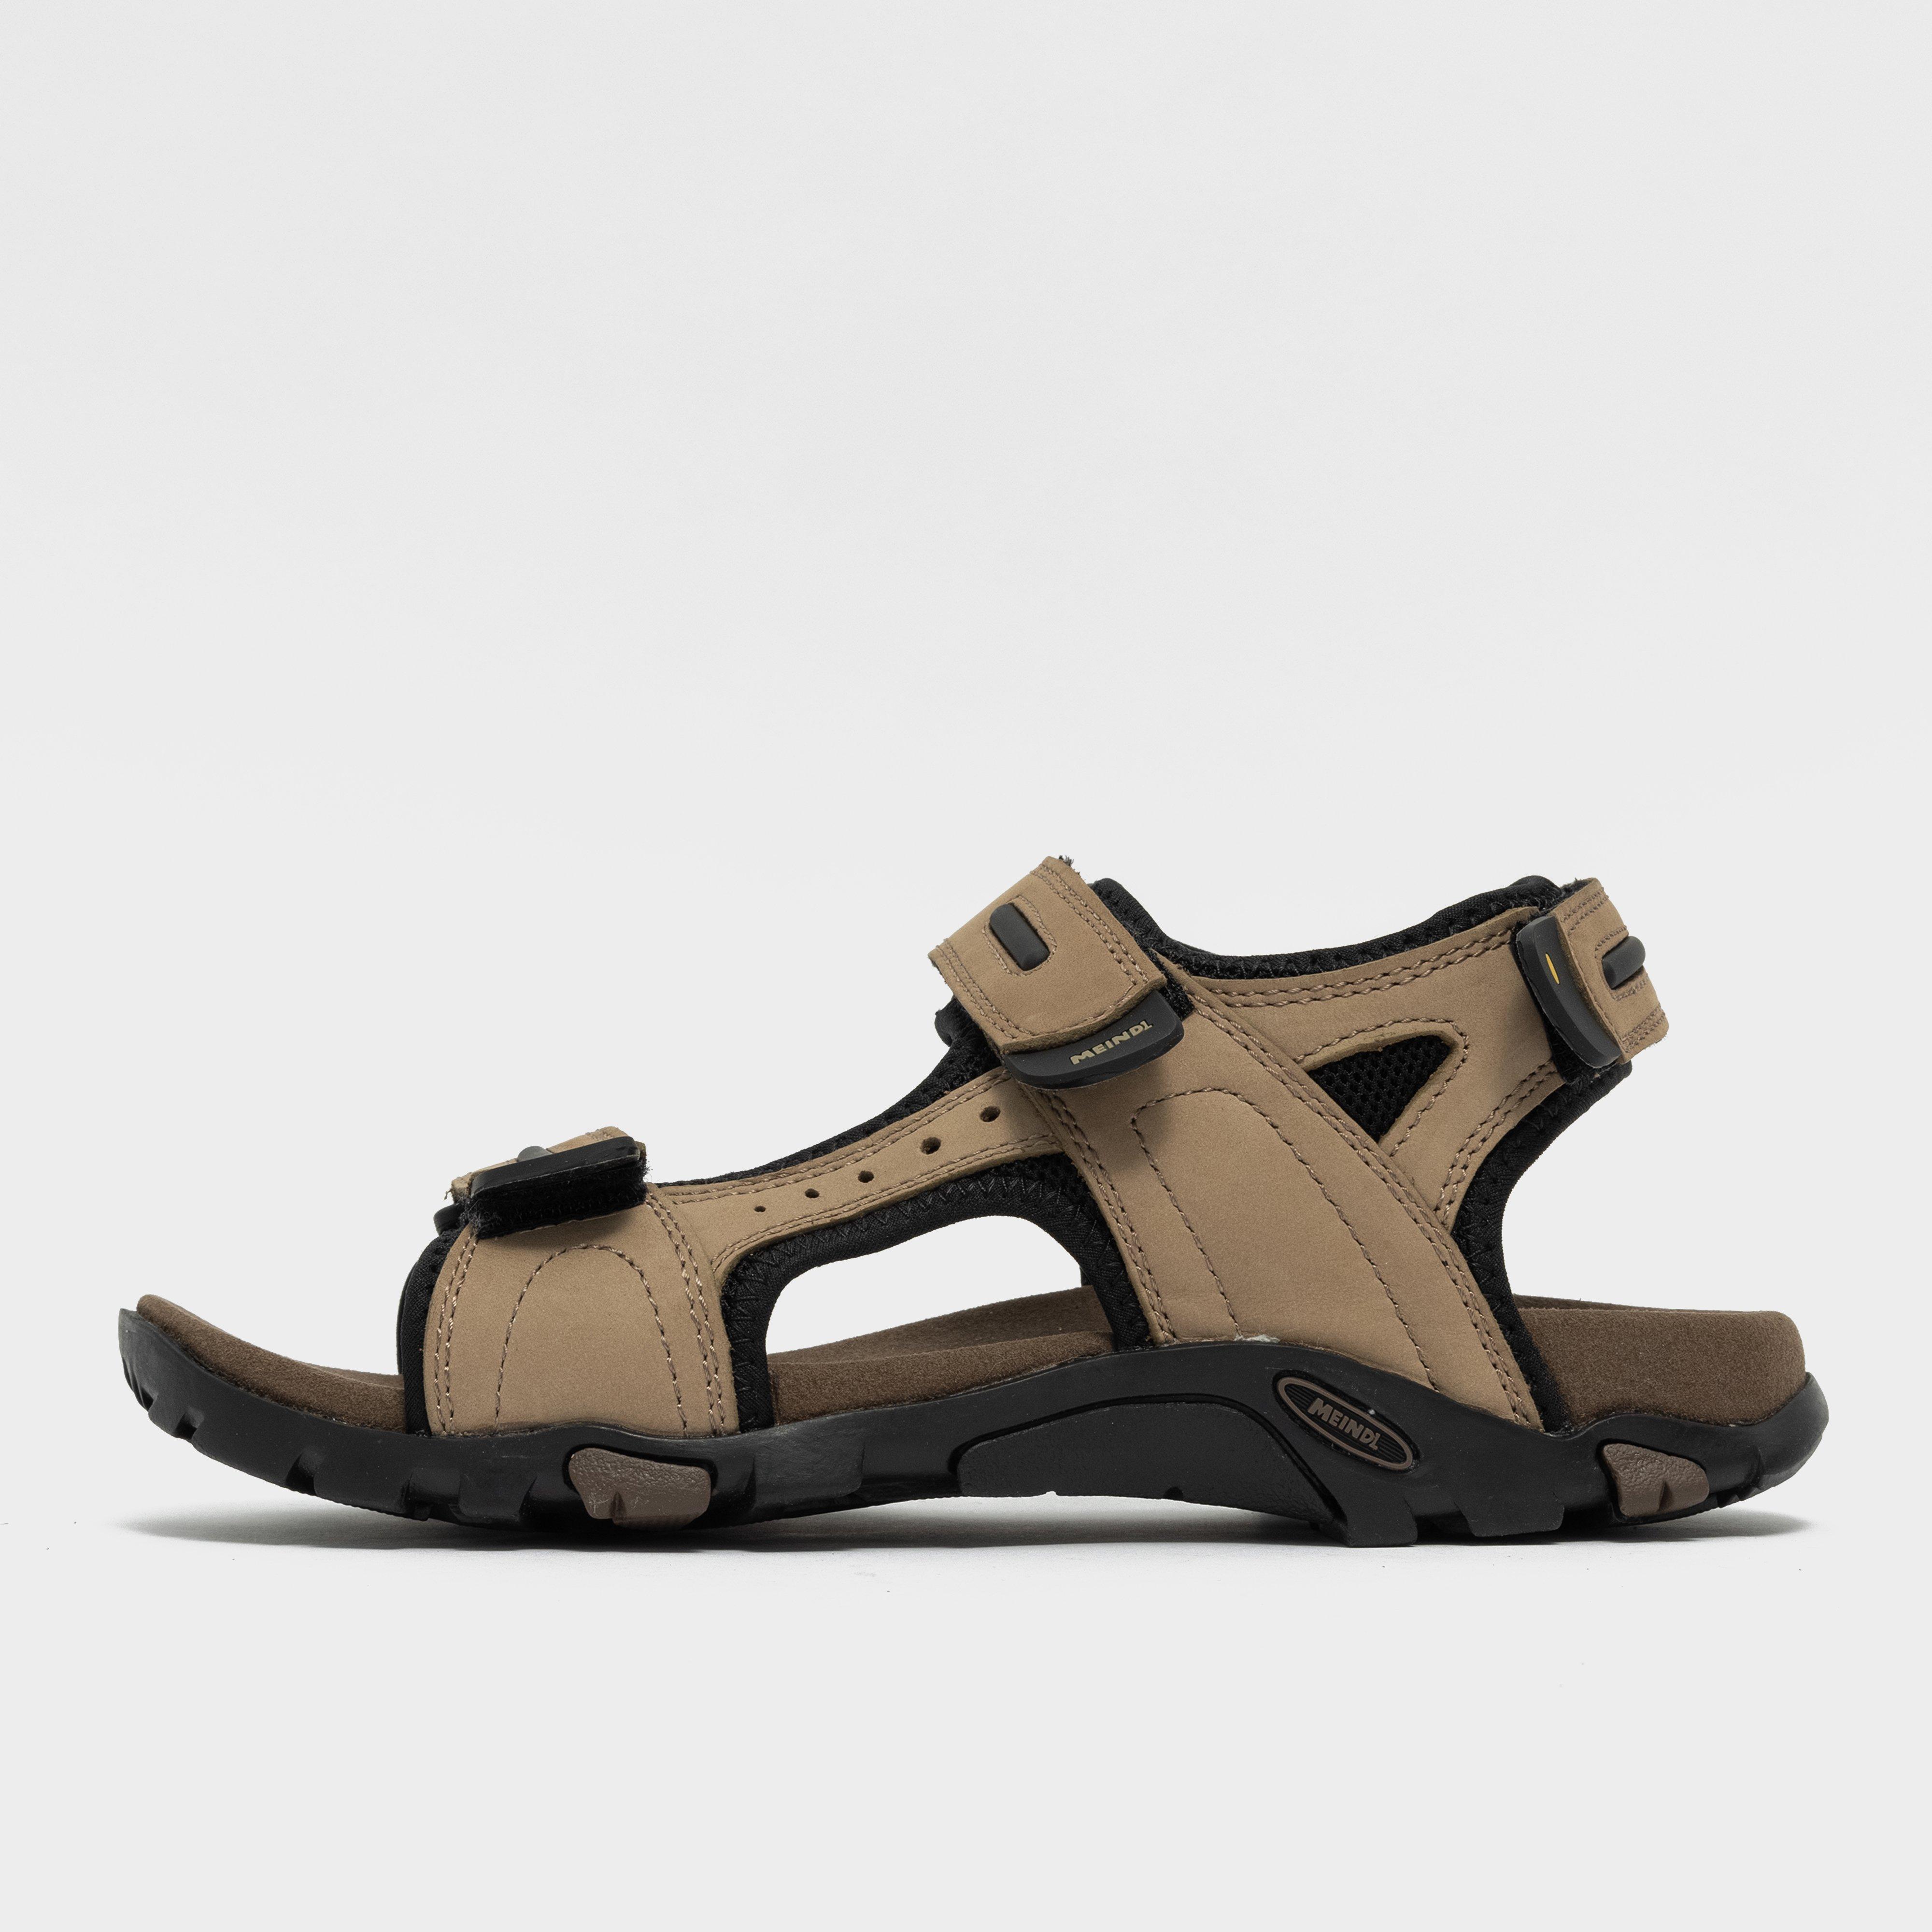 Meindl Meindl Womens Capri Sandals